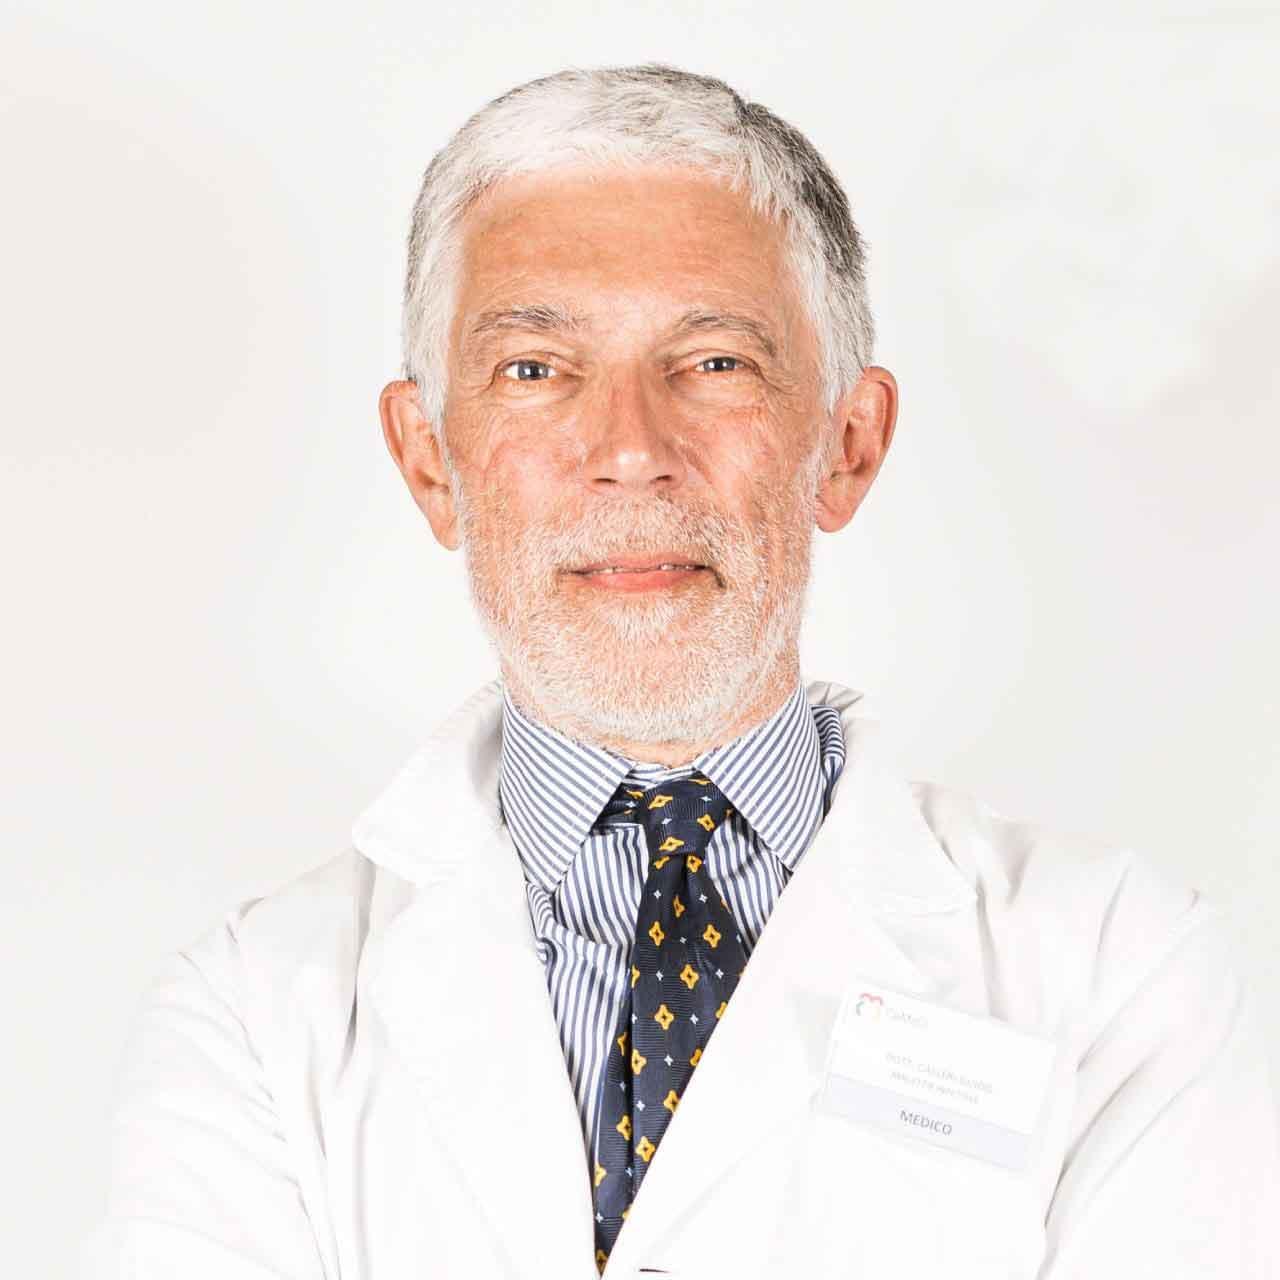 Calleri Dott. Guido